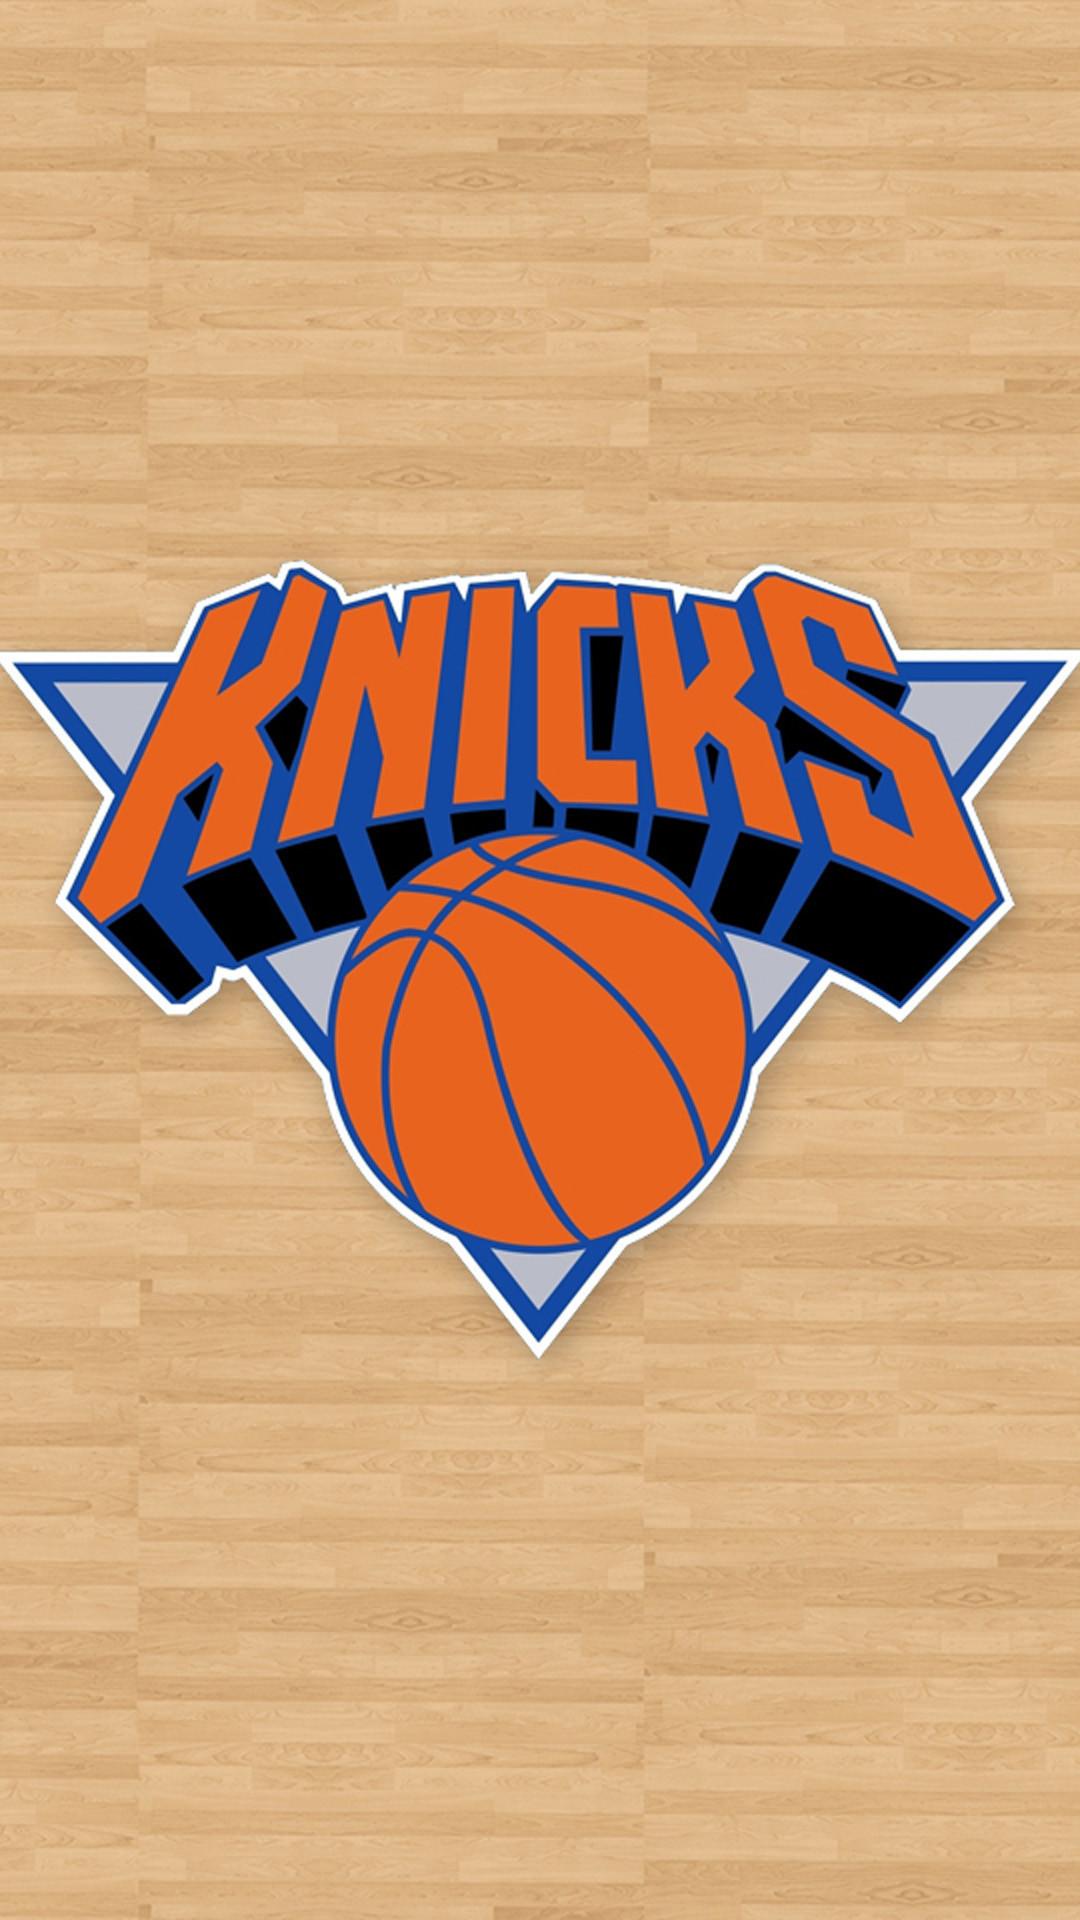 Res: 1080x1920, Knicks Iphone Wallpaper